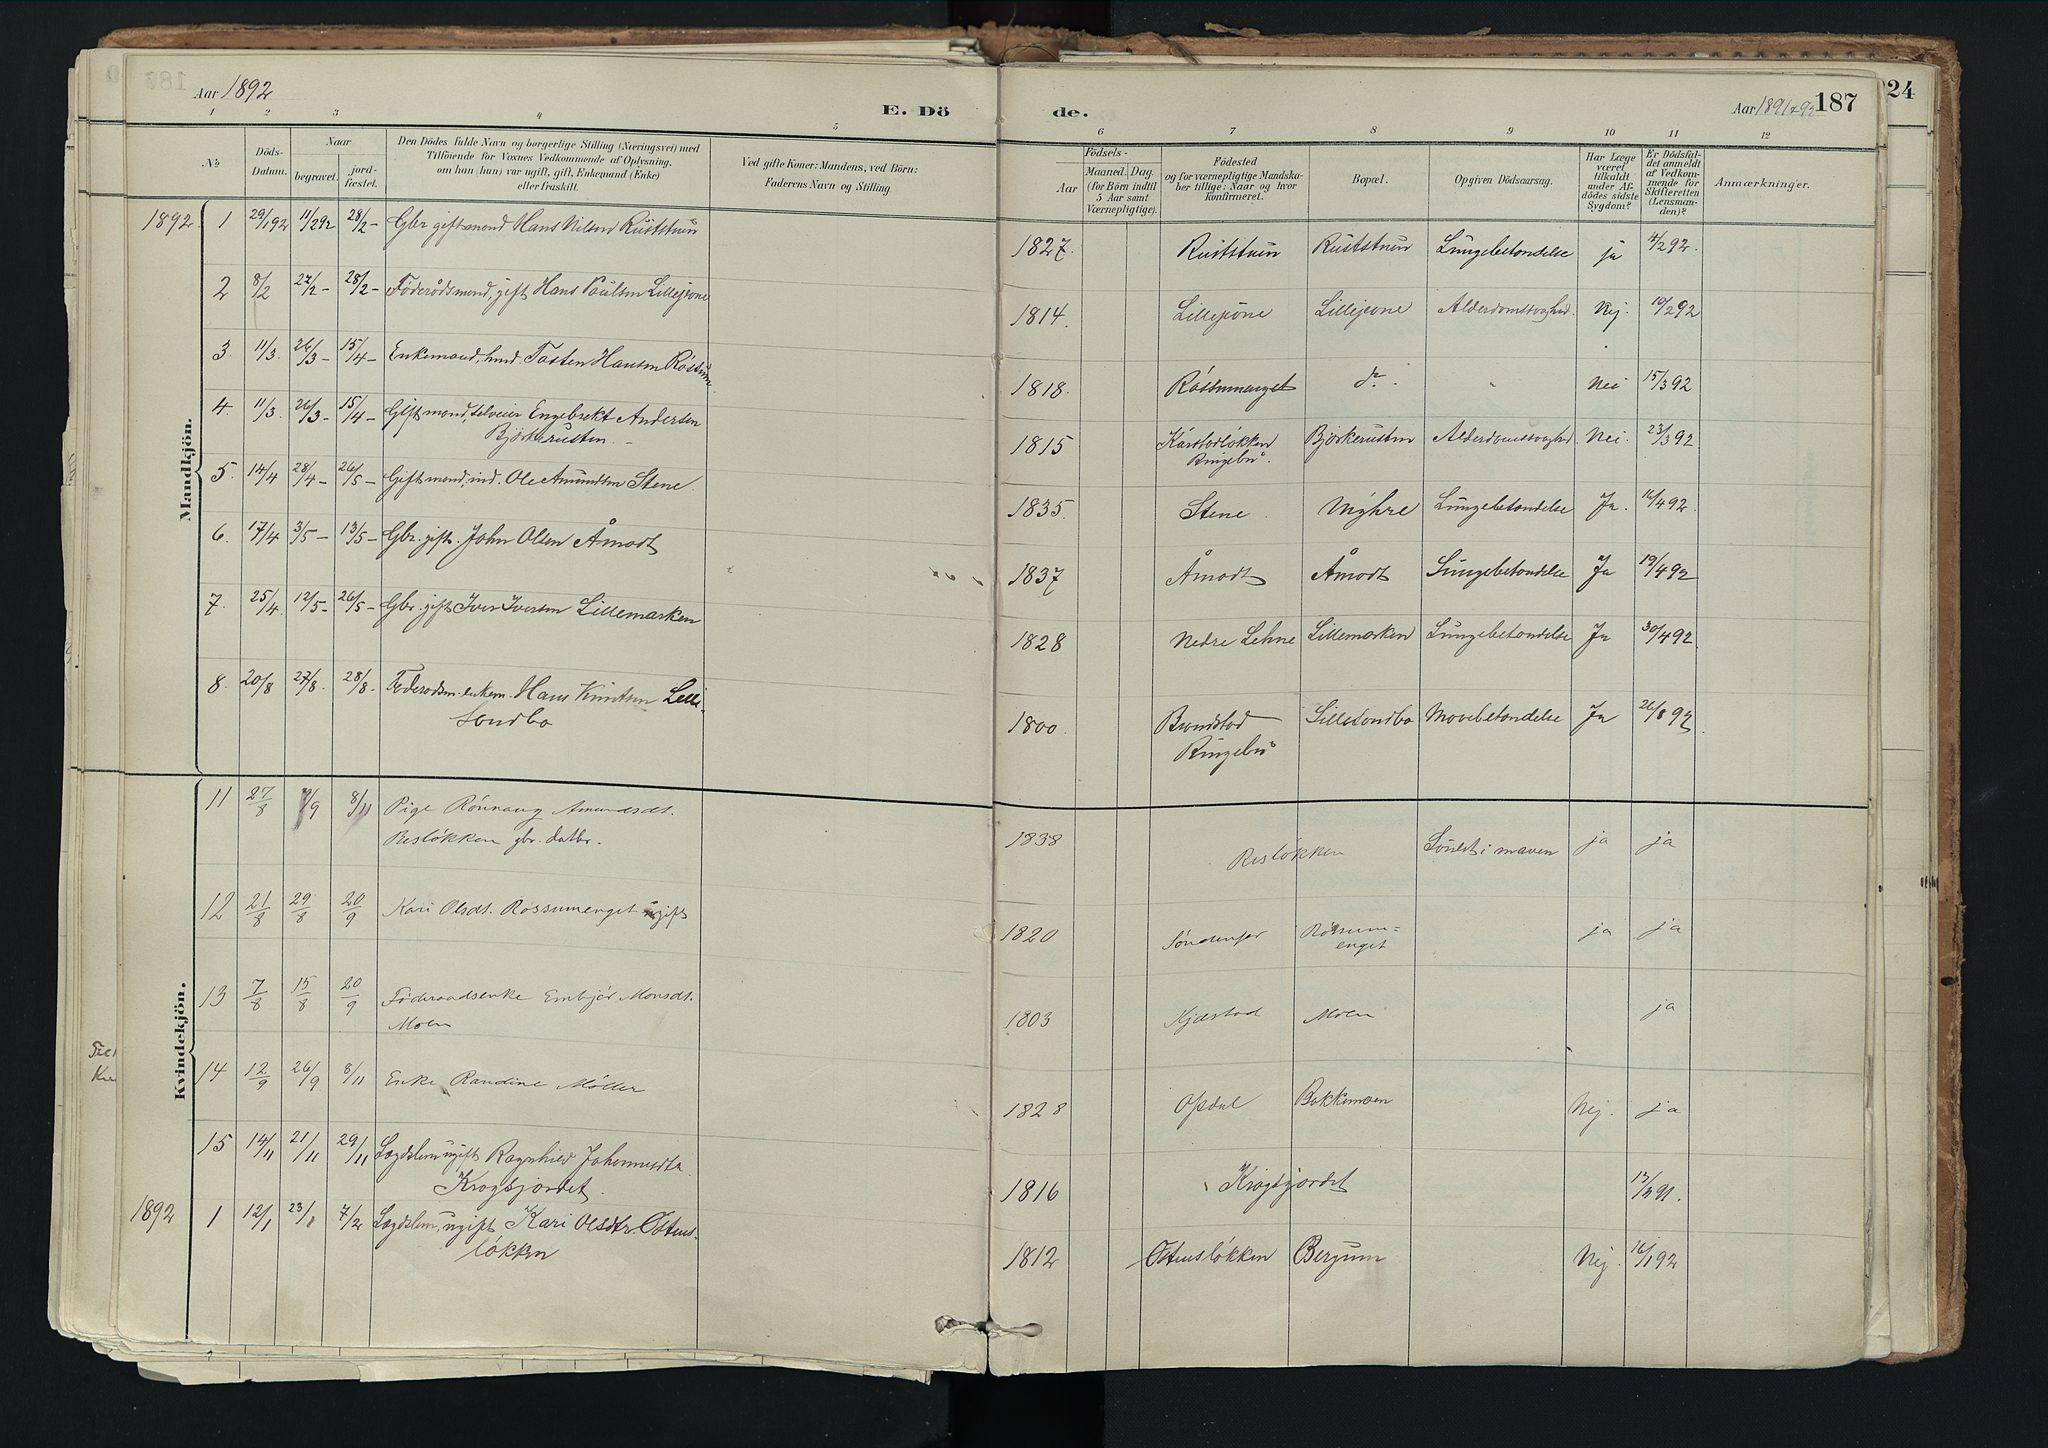 SAH, Nord-Fron prestekontor, Ministerialbok nr. 3, 1884-1914, s. 187